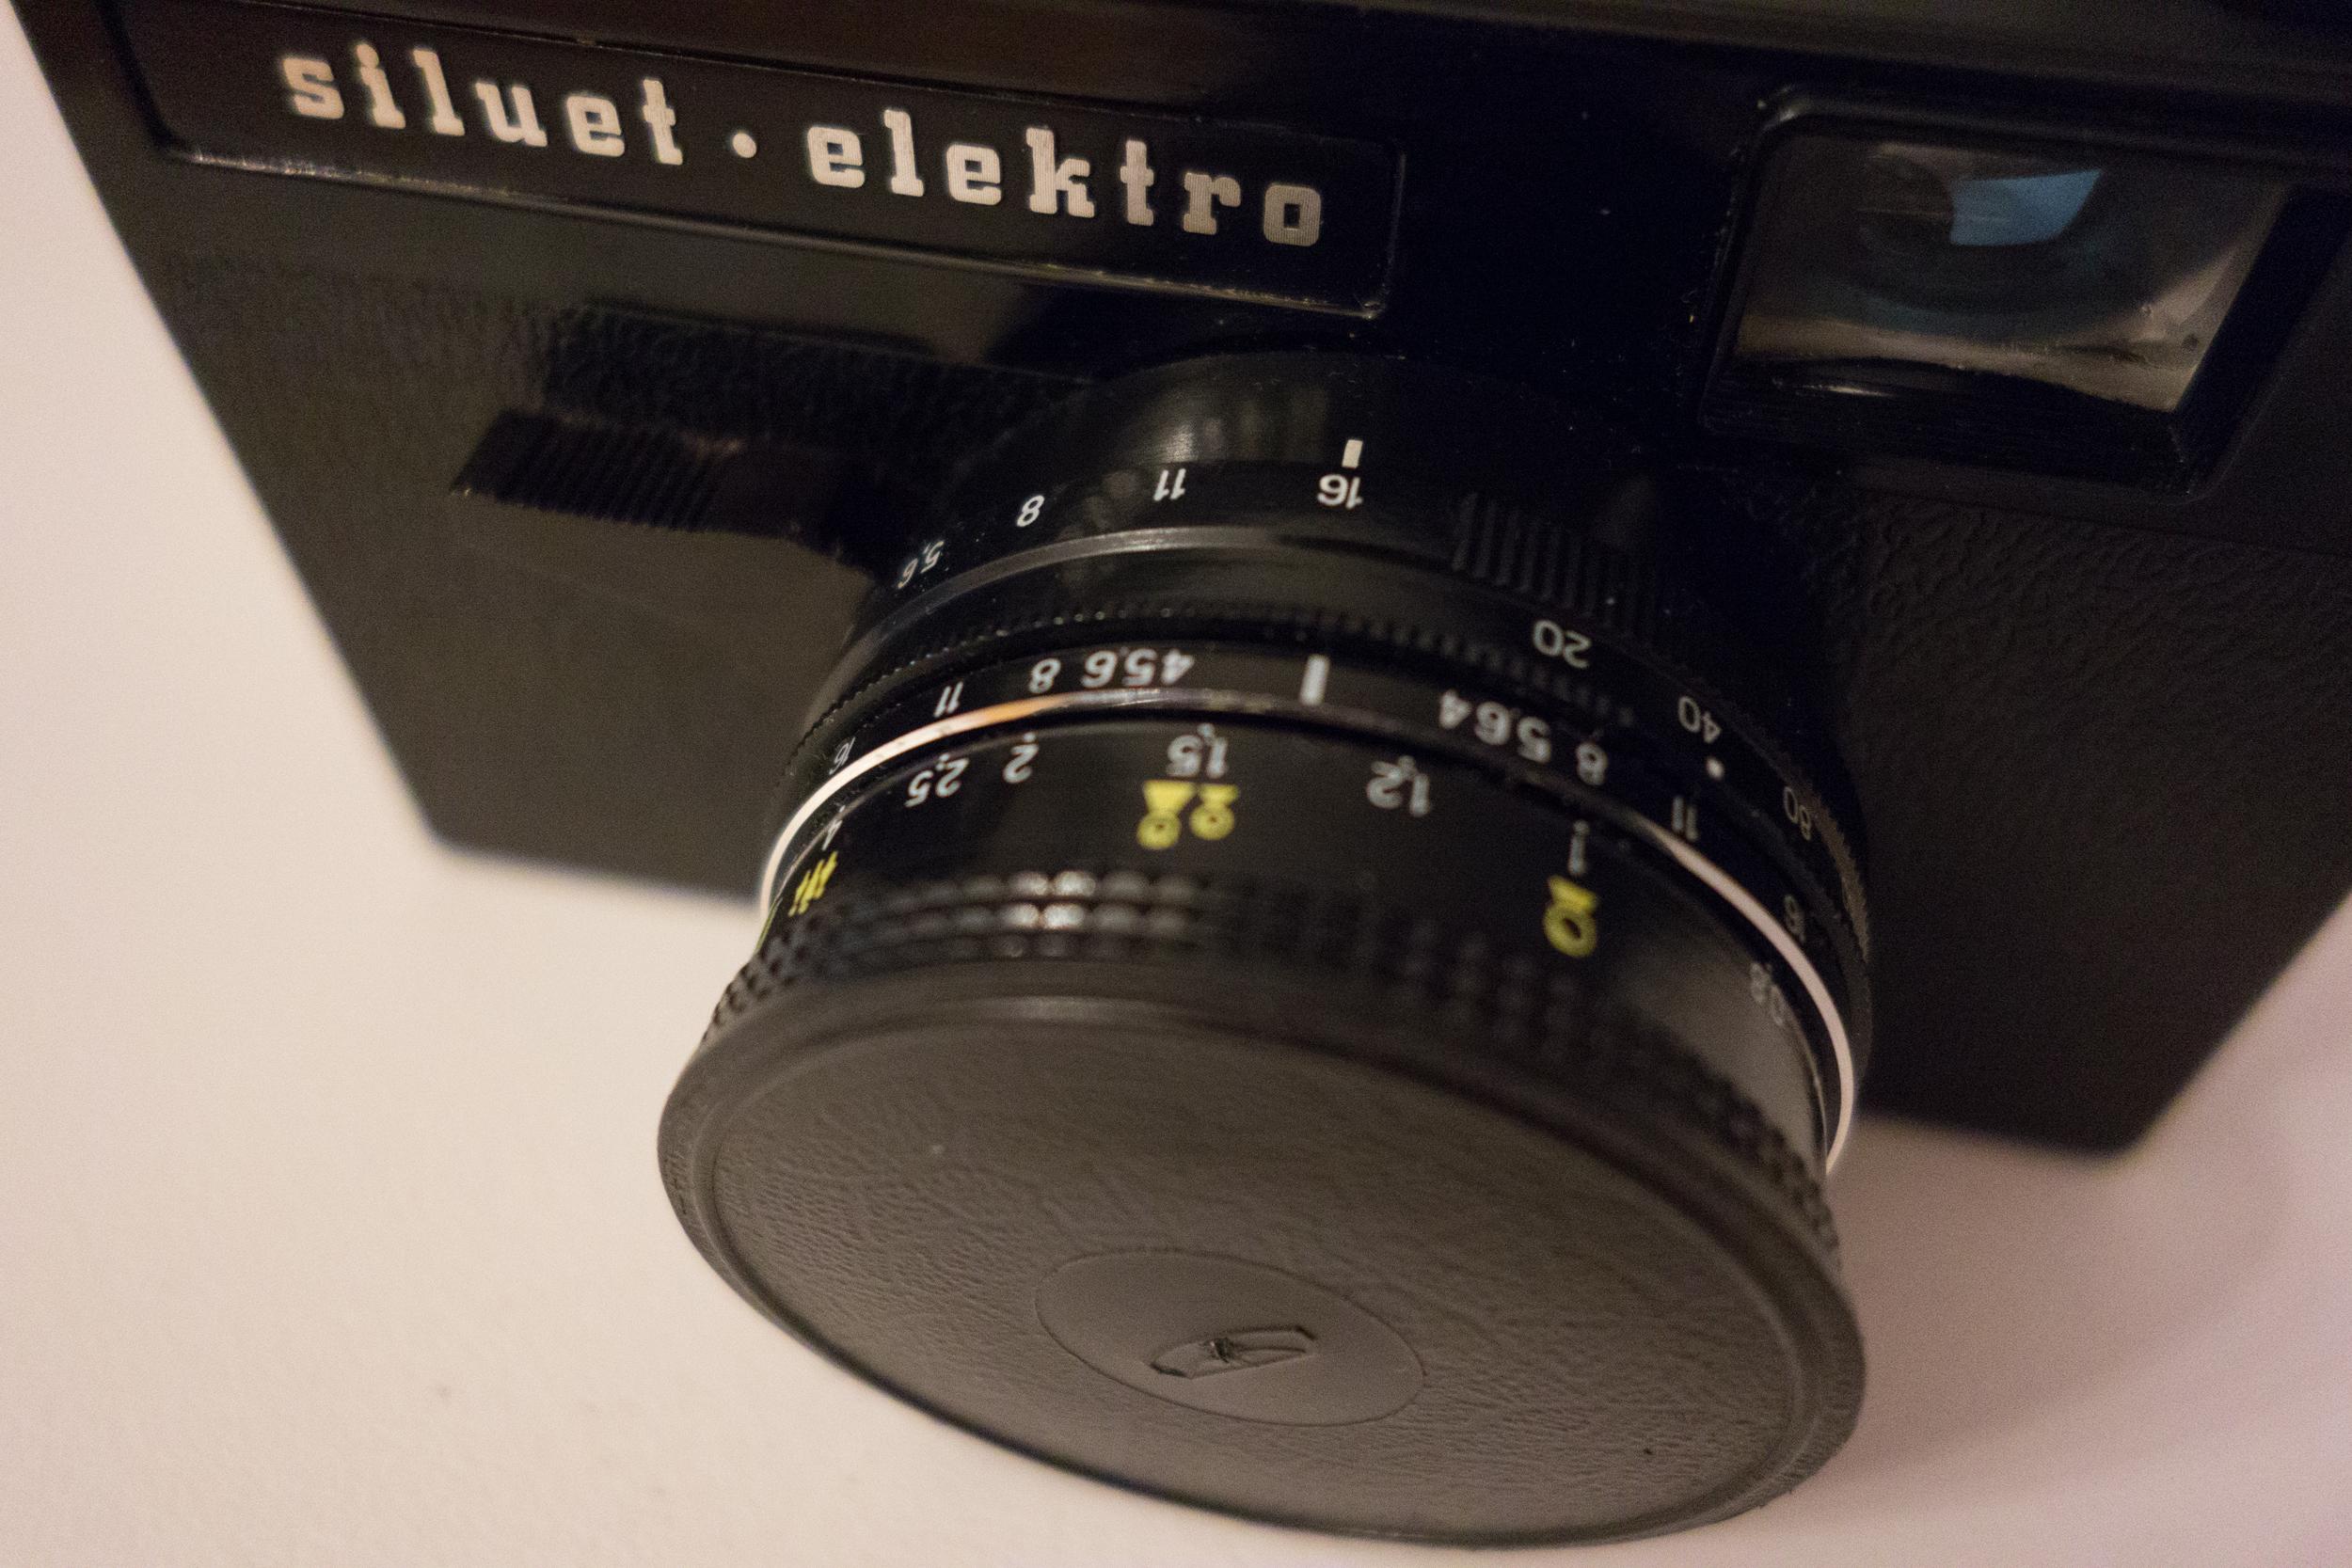 BelOMO Siluet-Elektro lens (Pic: Stephen Dowling)